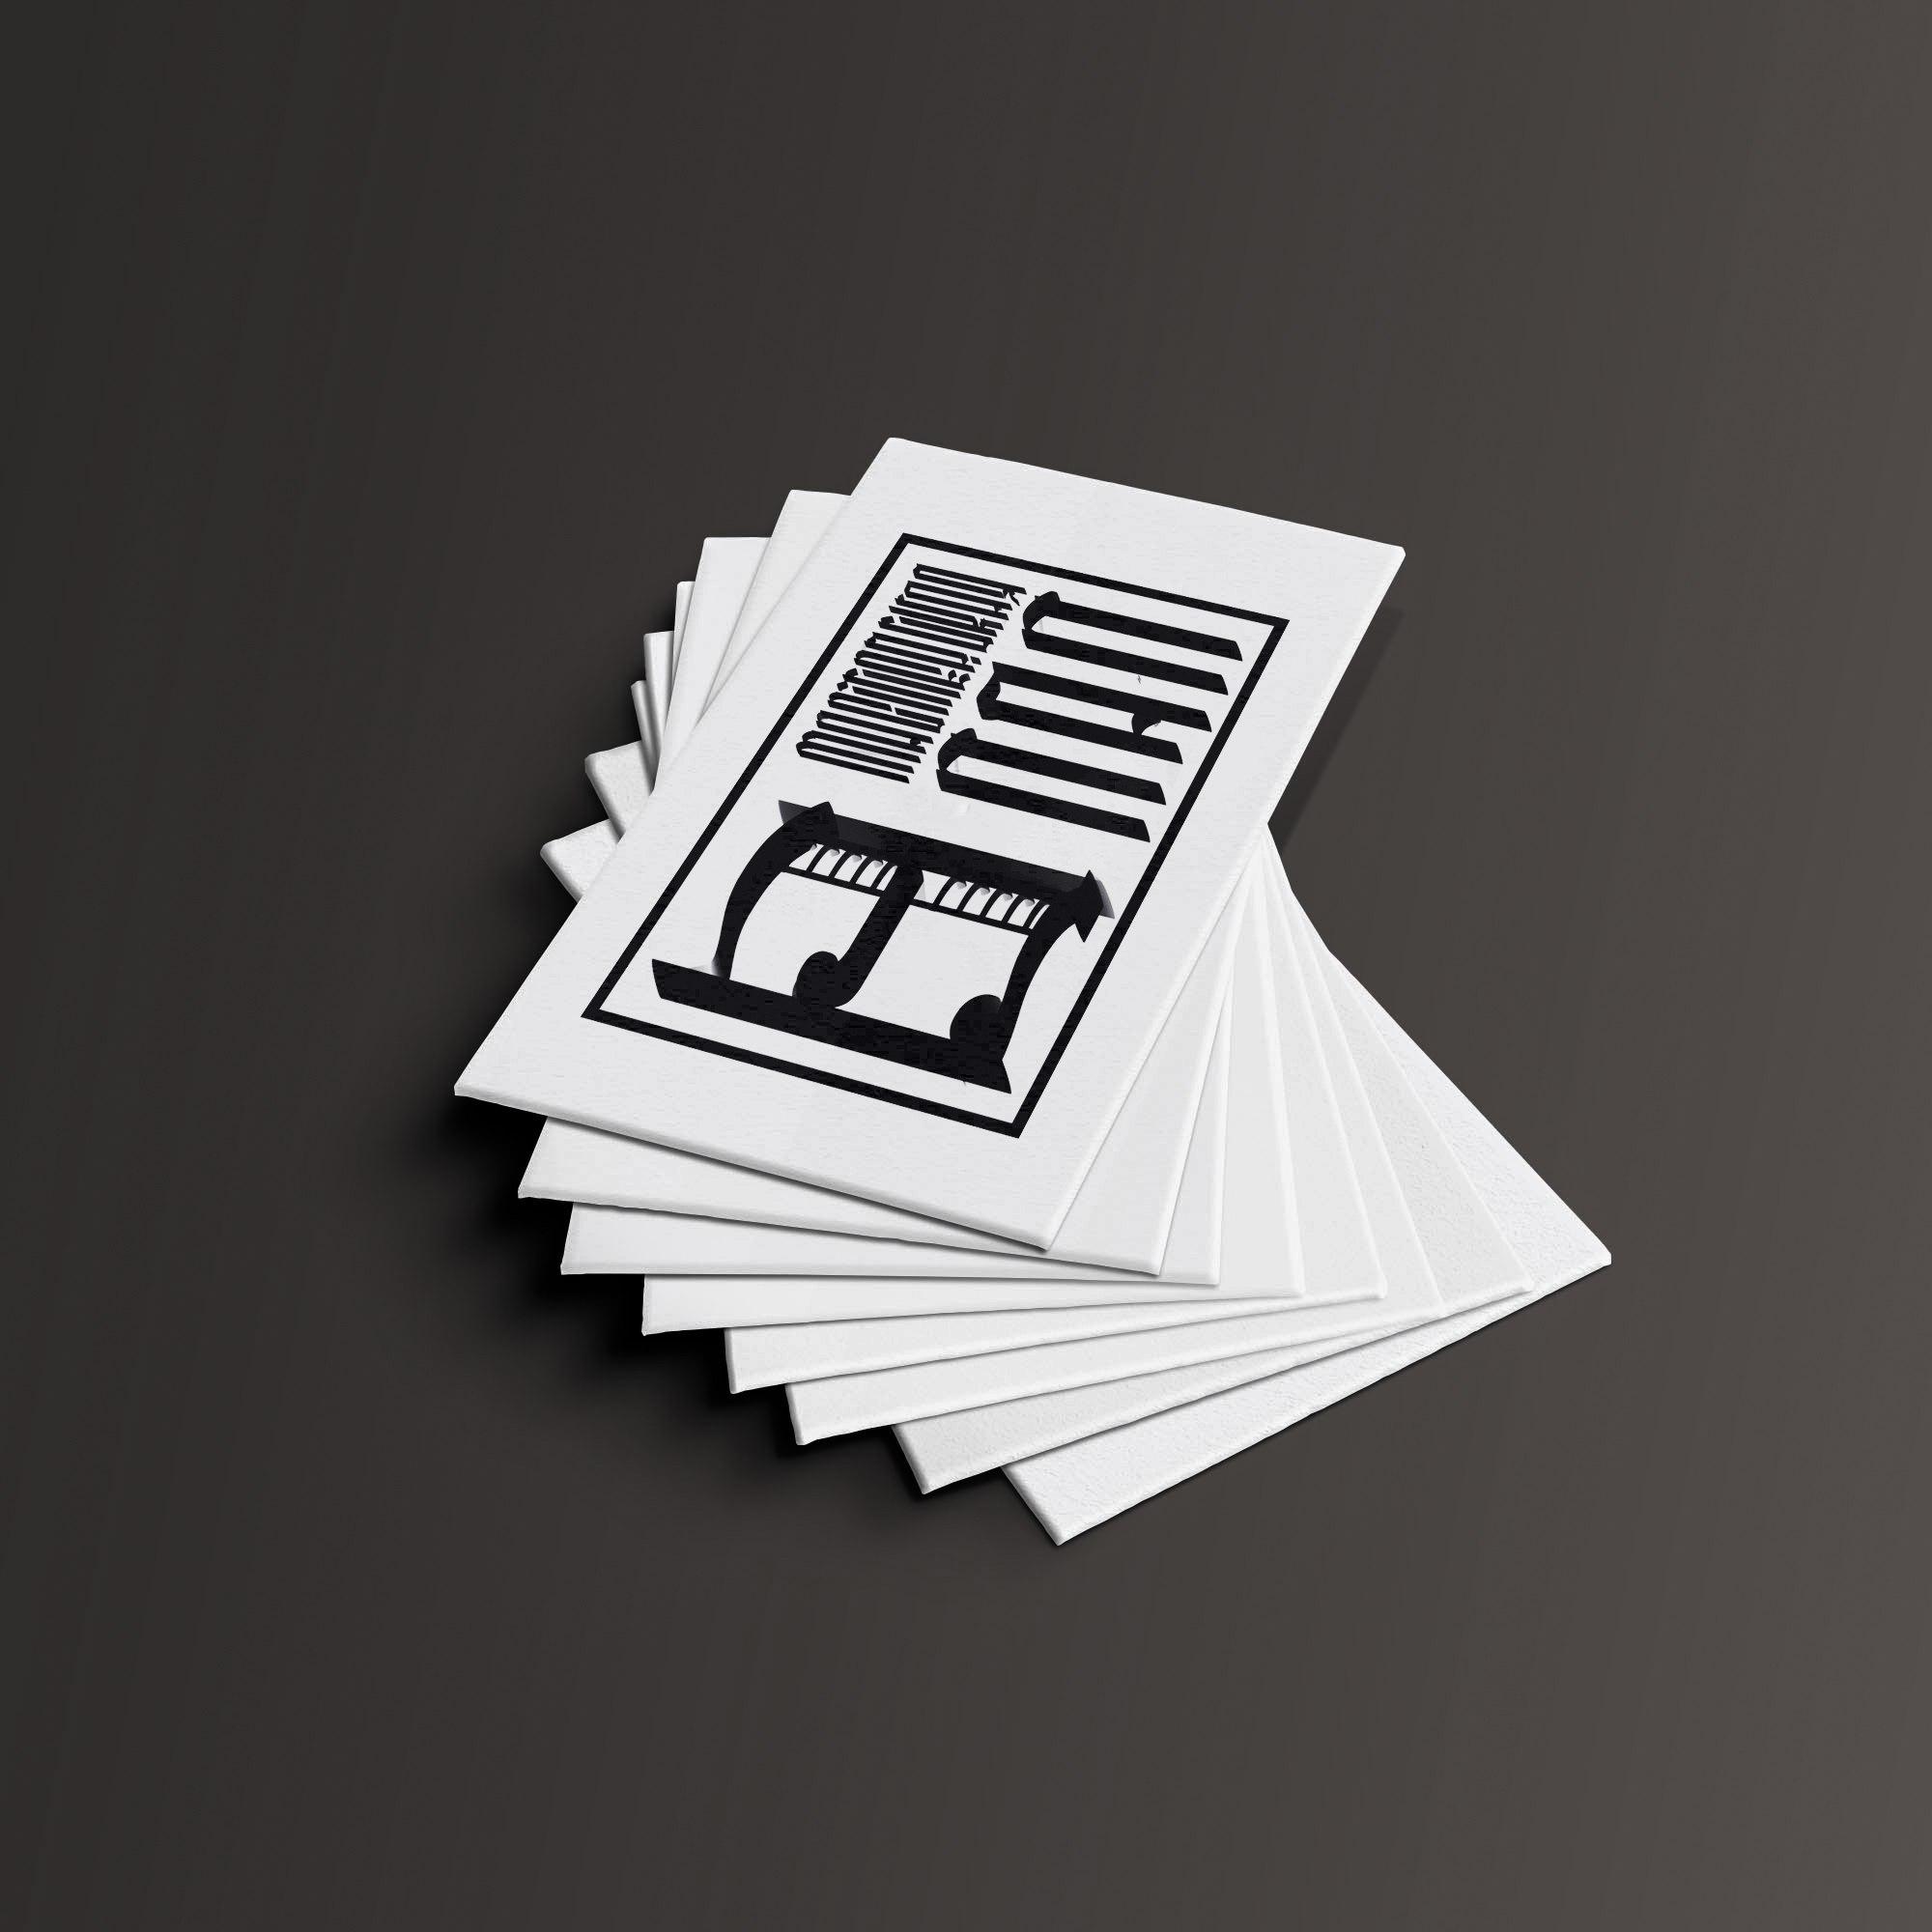 Разработка логотипа  фото f_8105aa689bf49ce9.jpg